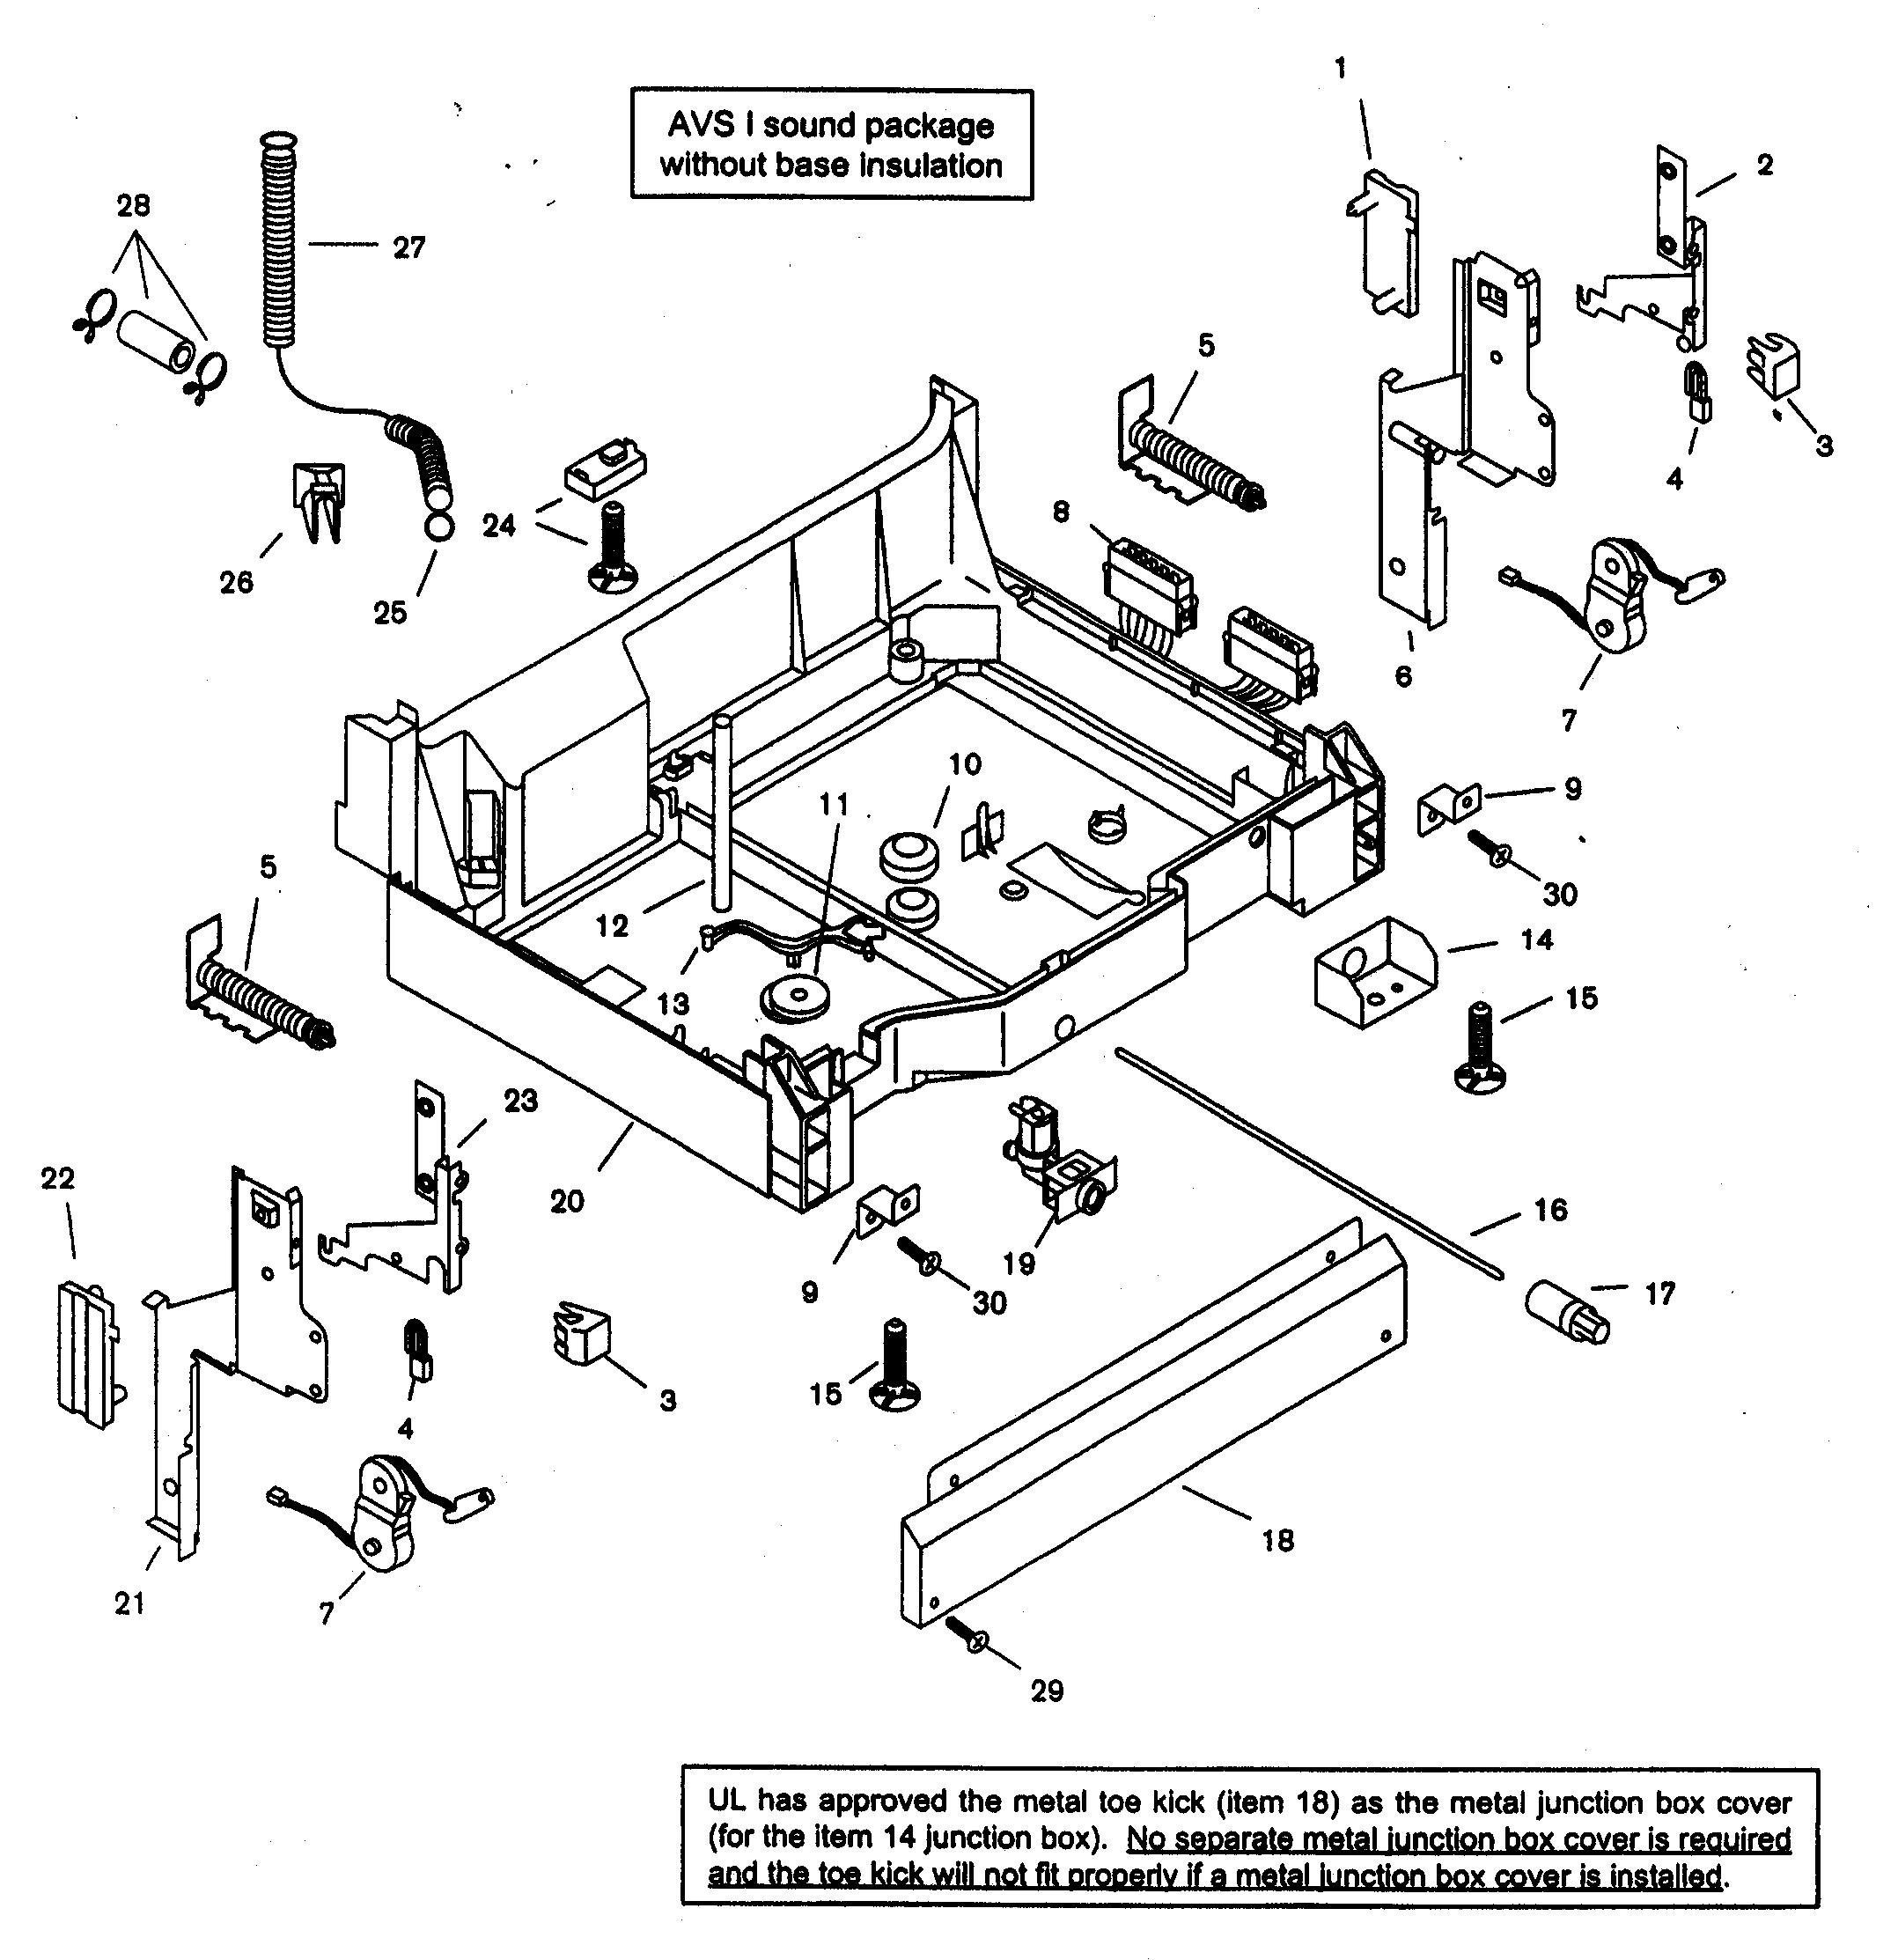 I Have A Bosch Electronic Dishwasher Model Shu53e05uc    14